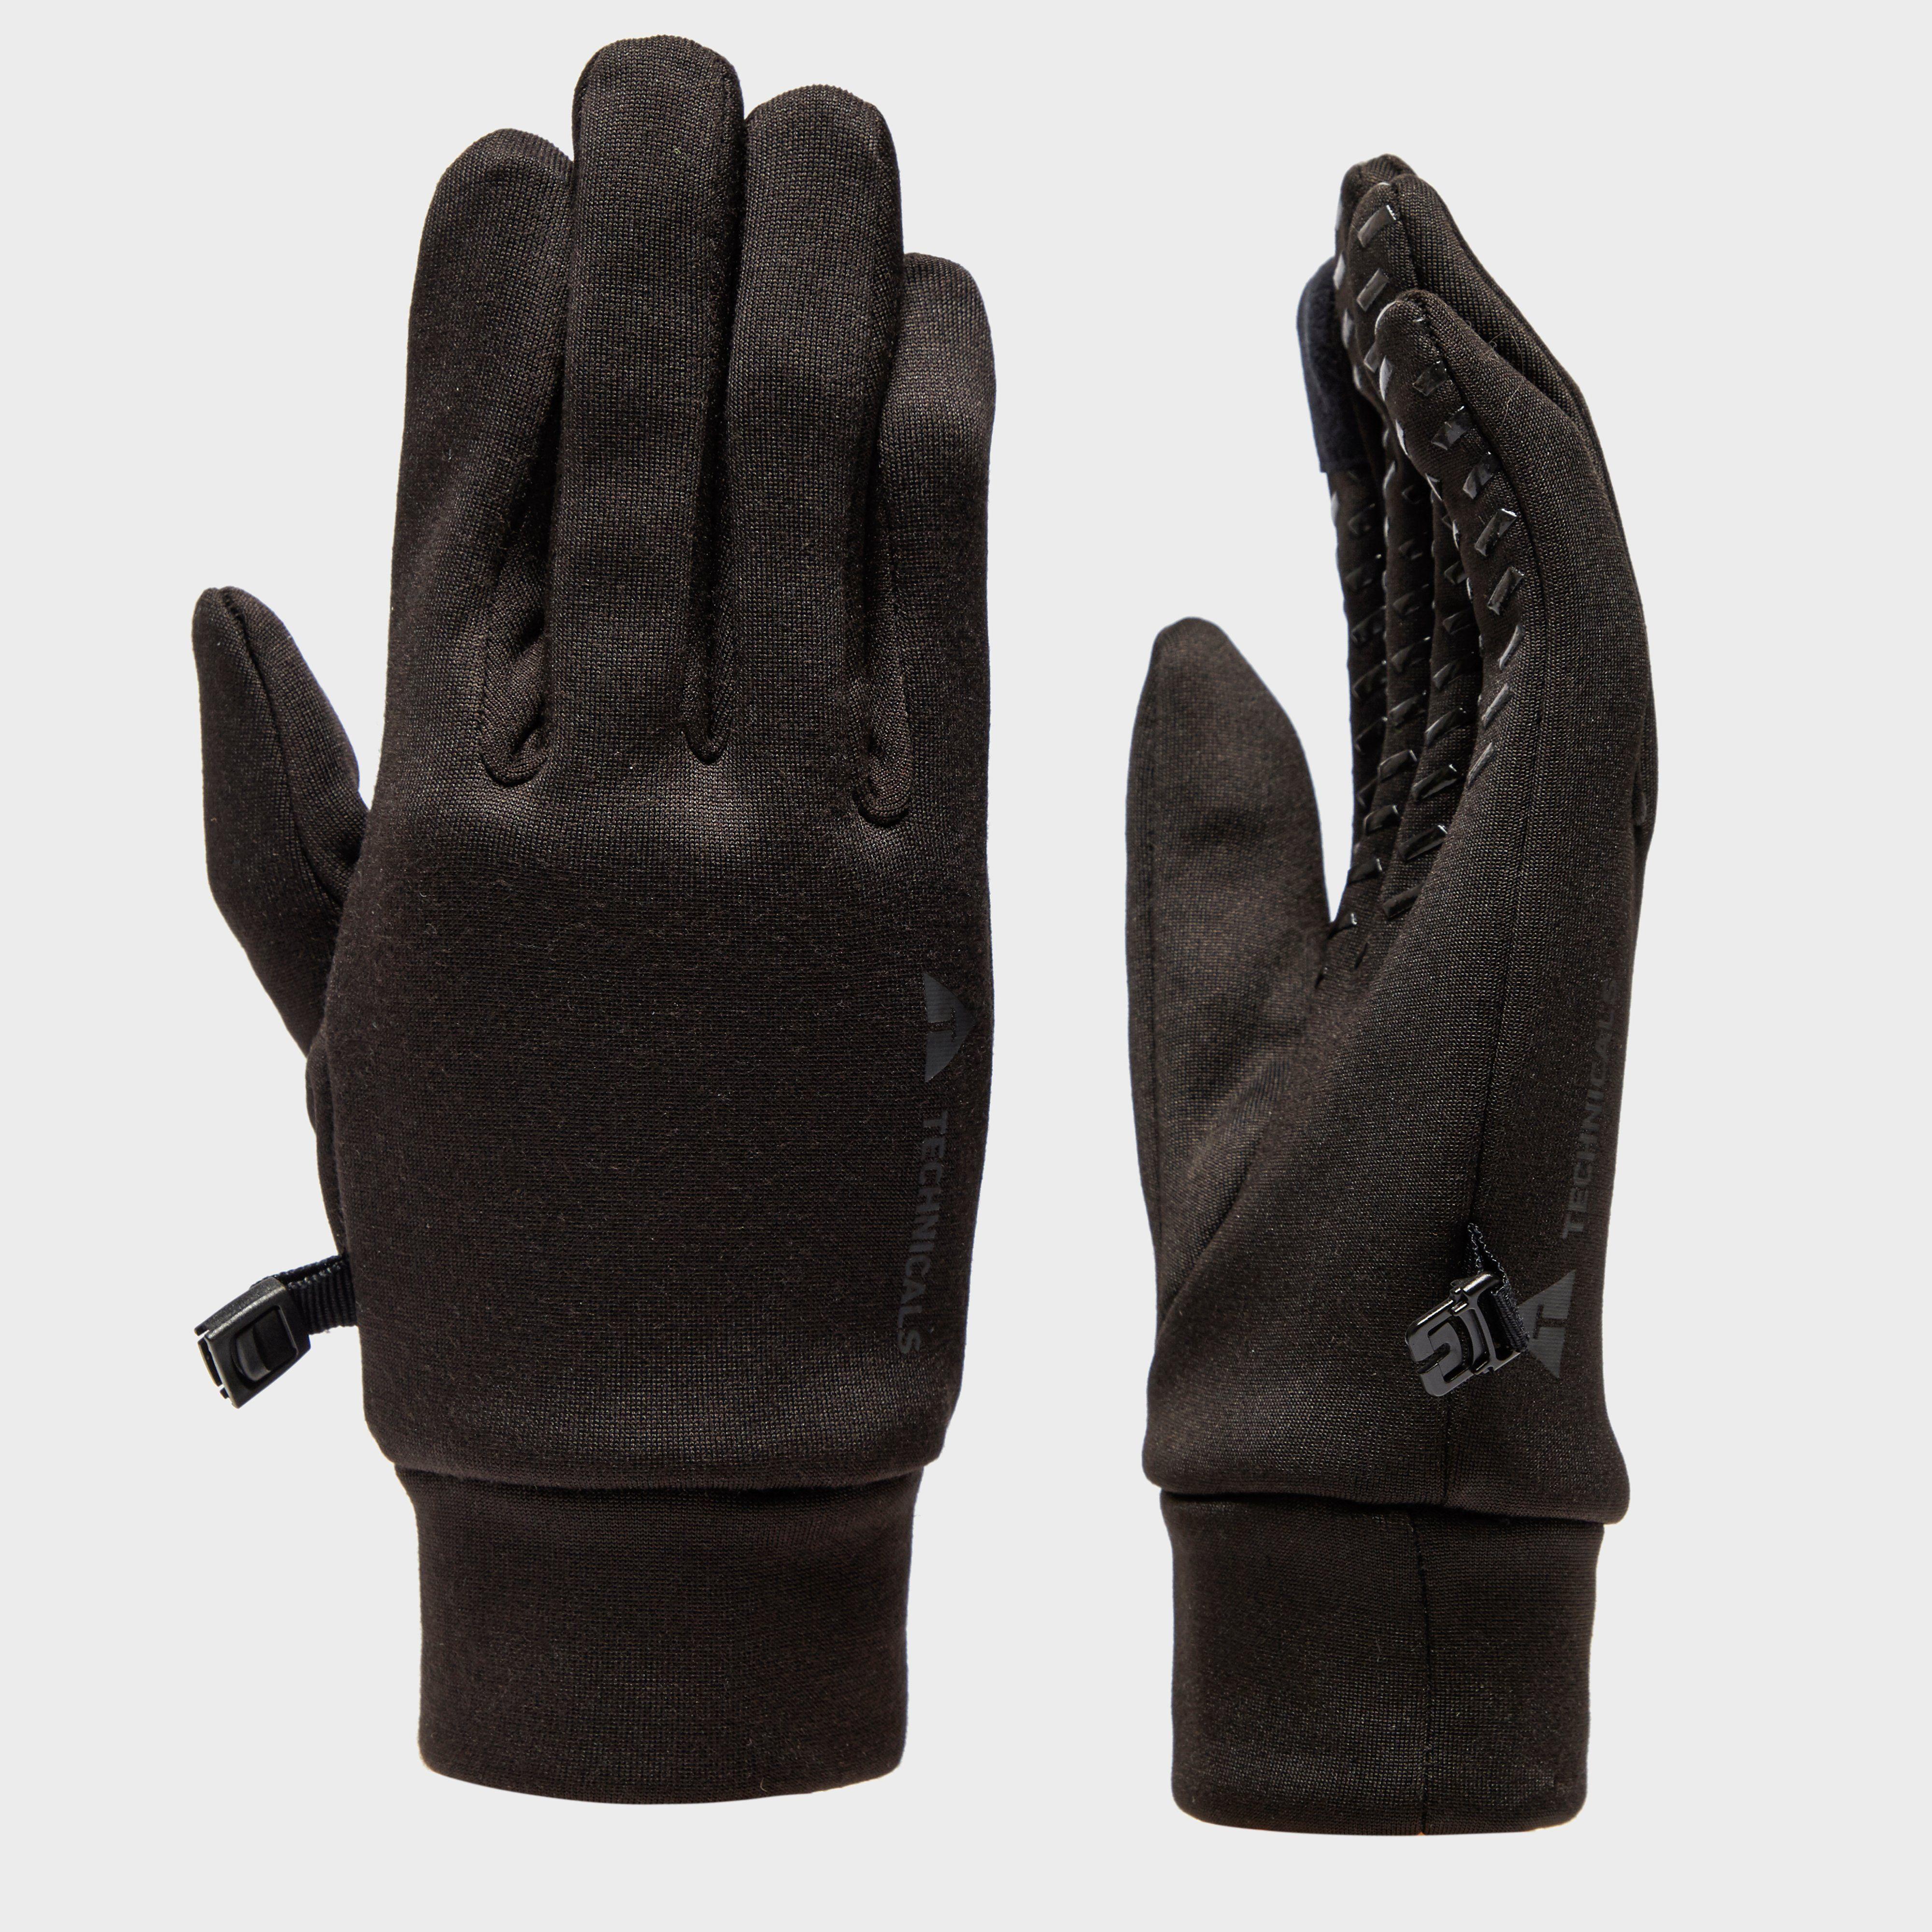 TECHNICALS Touch Screen Glove